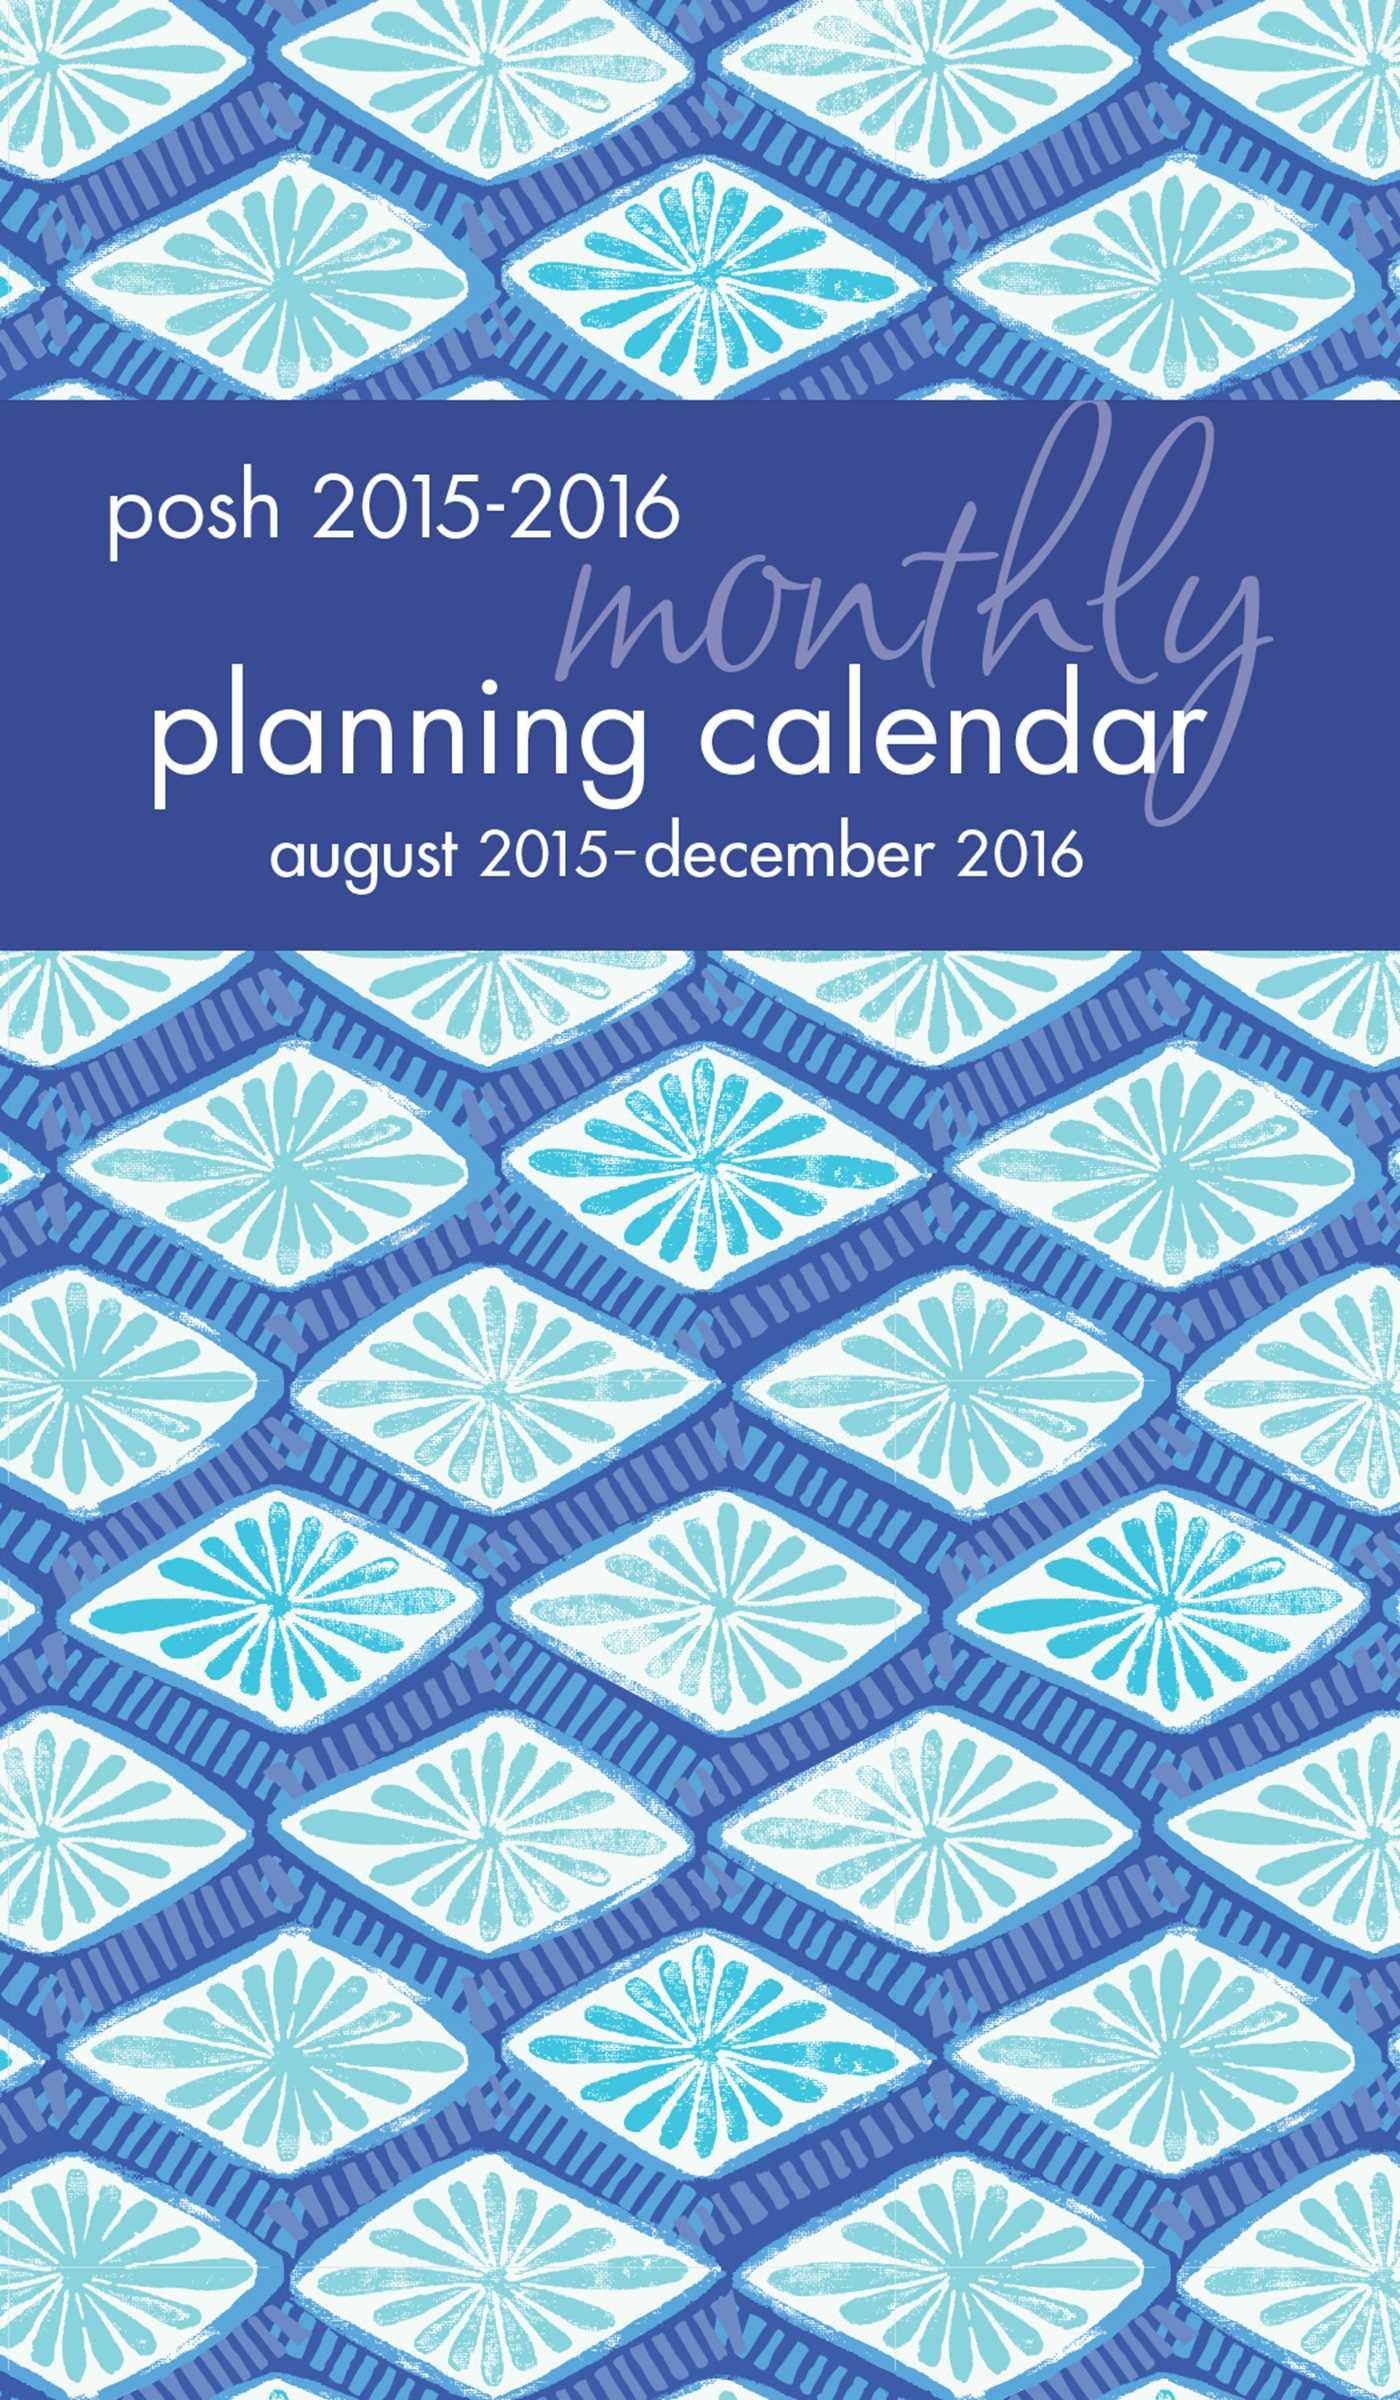 posh indigo 2015 2016 monthly pocket planning calendar kate spain